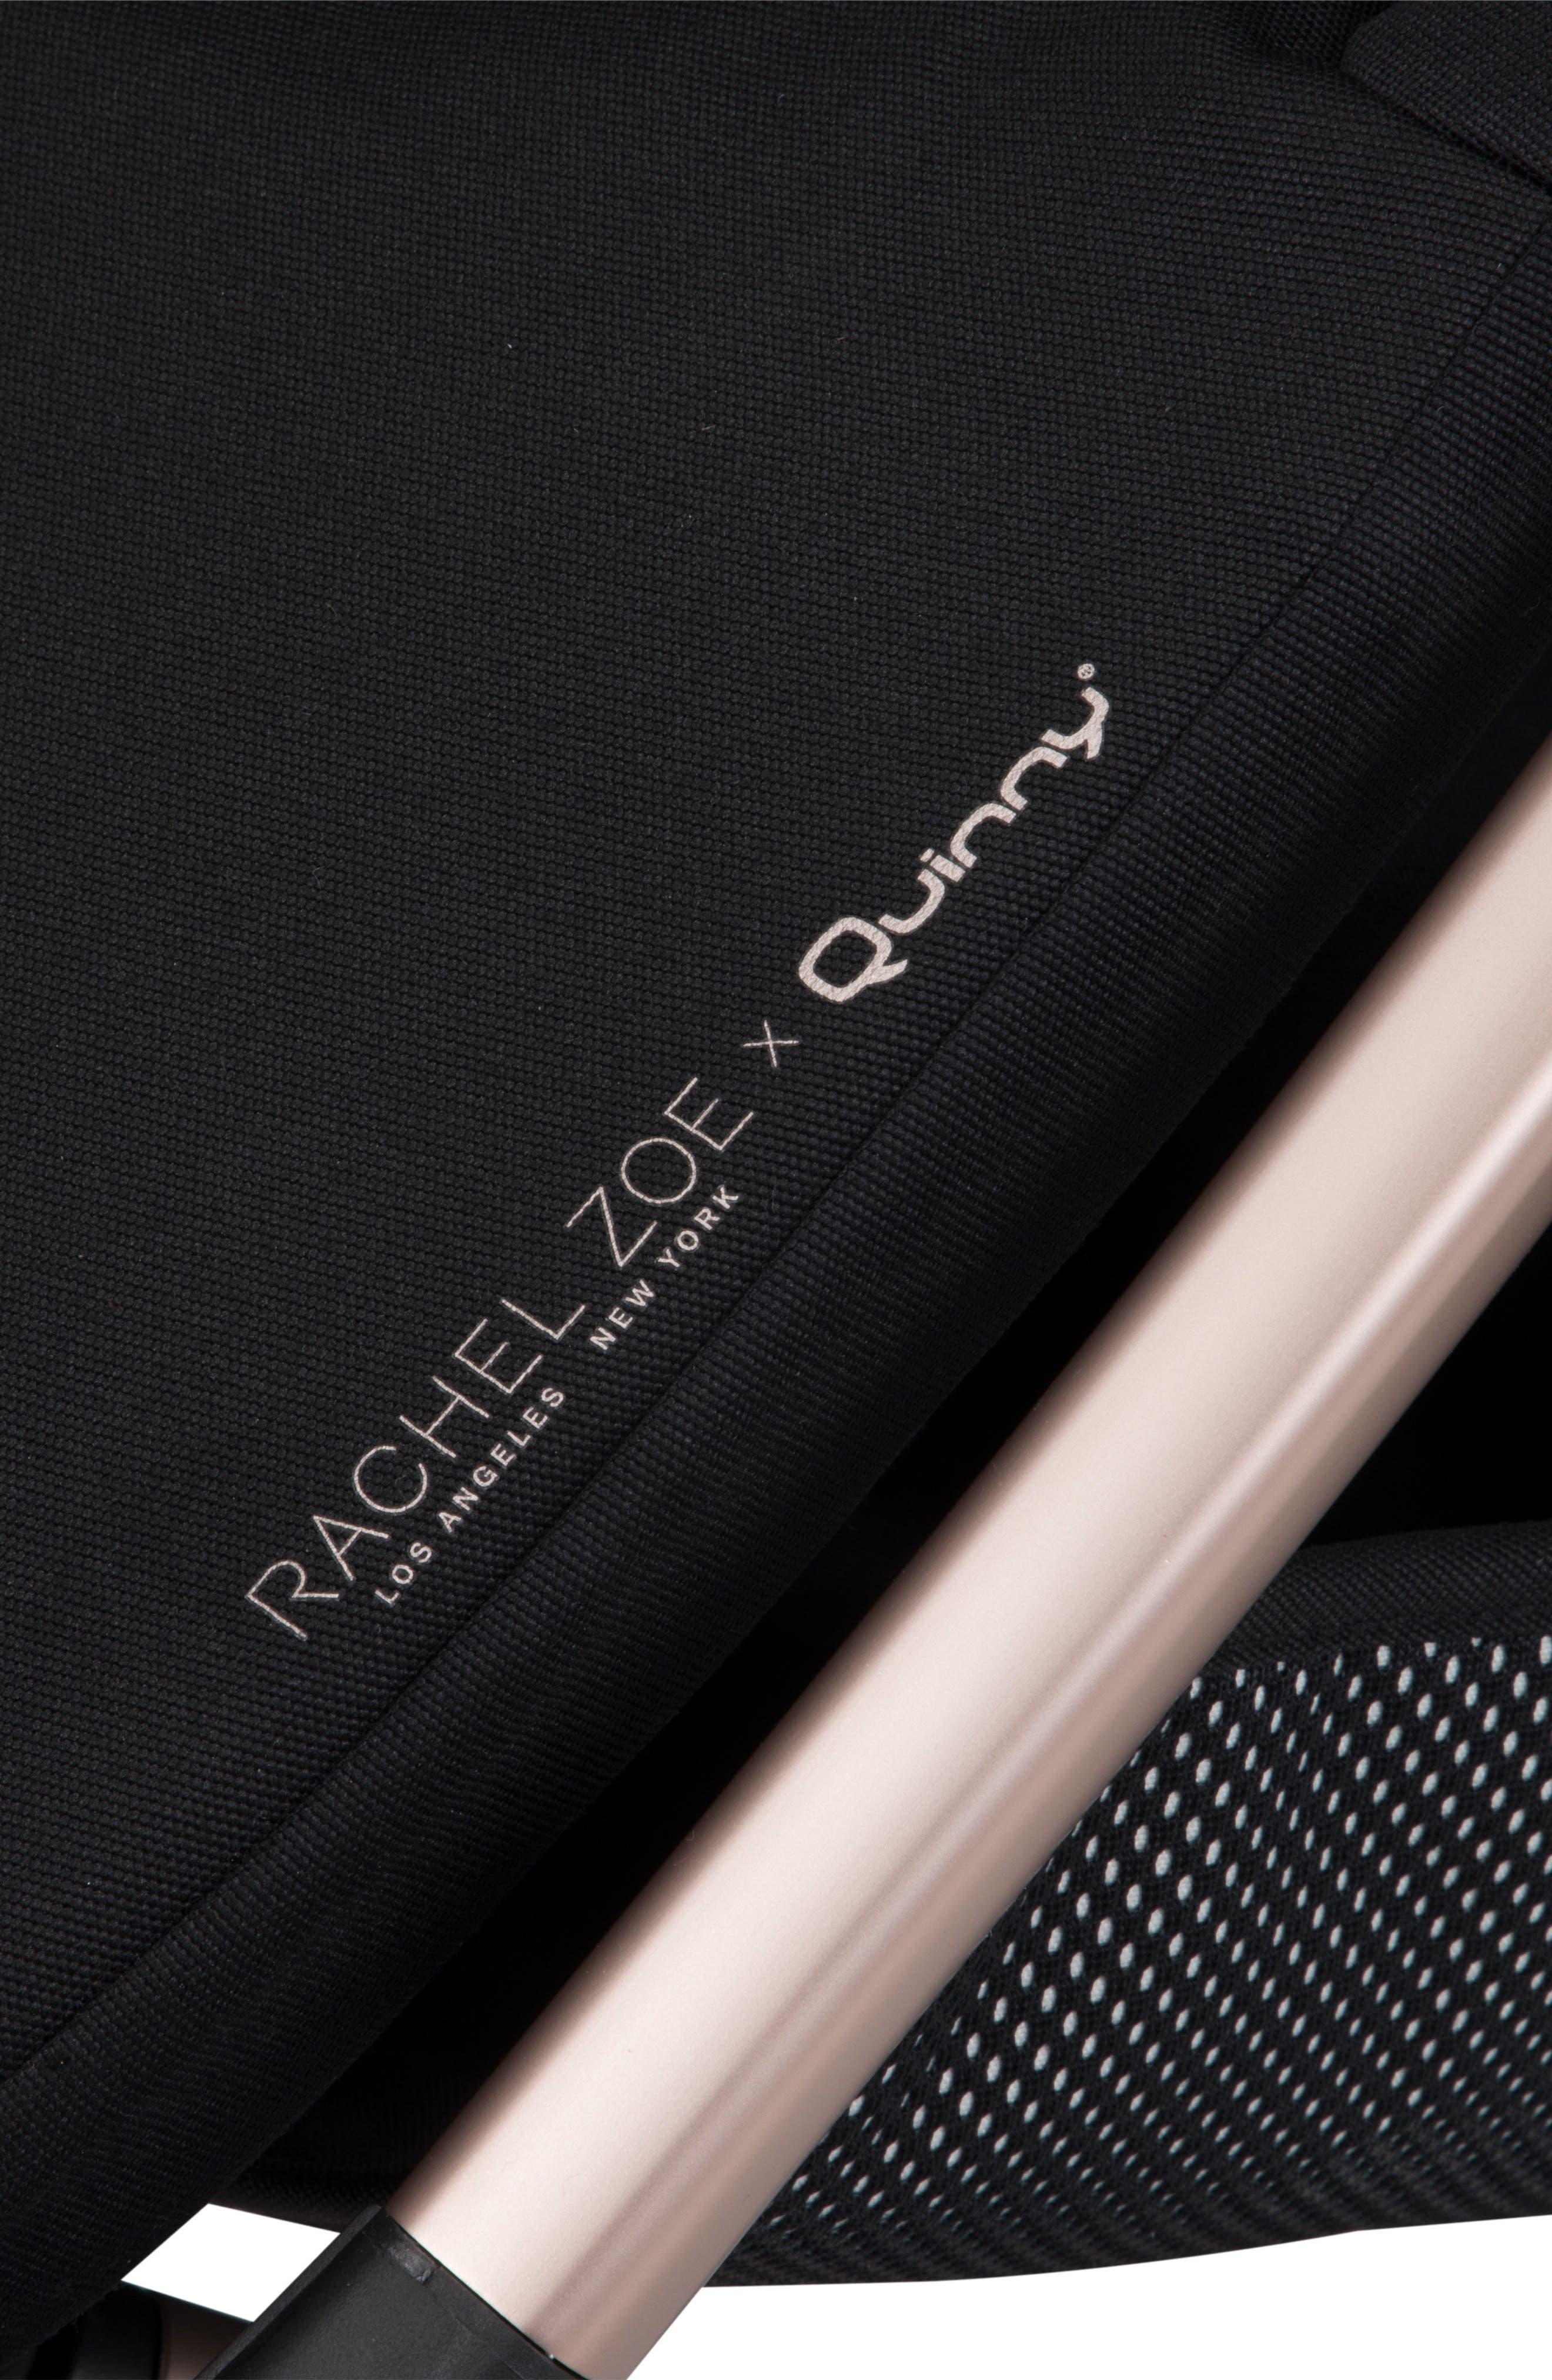 x Rachel Zoe Zapp Flex Luxe Sport Stroller,                             Alternate thumbnail 12, color,                             Rz Luxe Sport